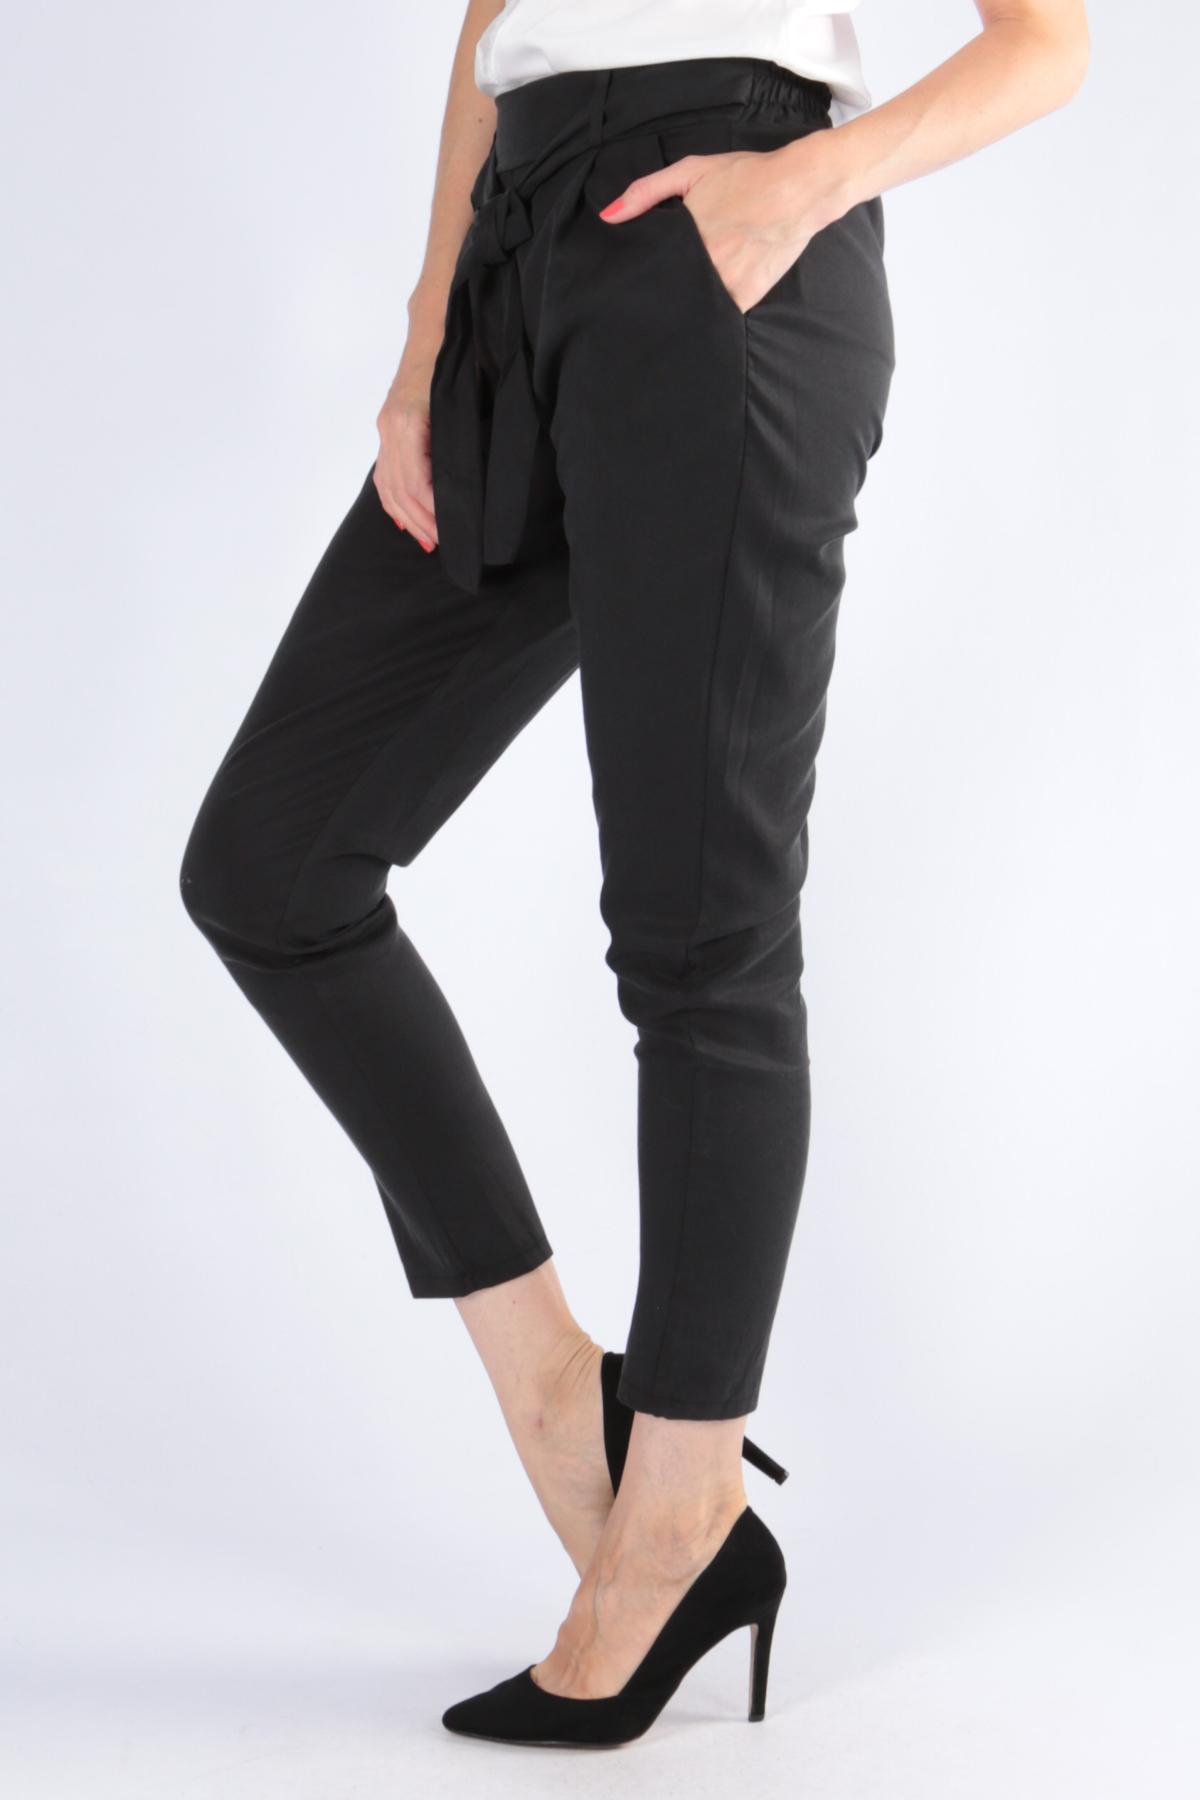 Dámske čierne nohavice s opaskom - M